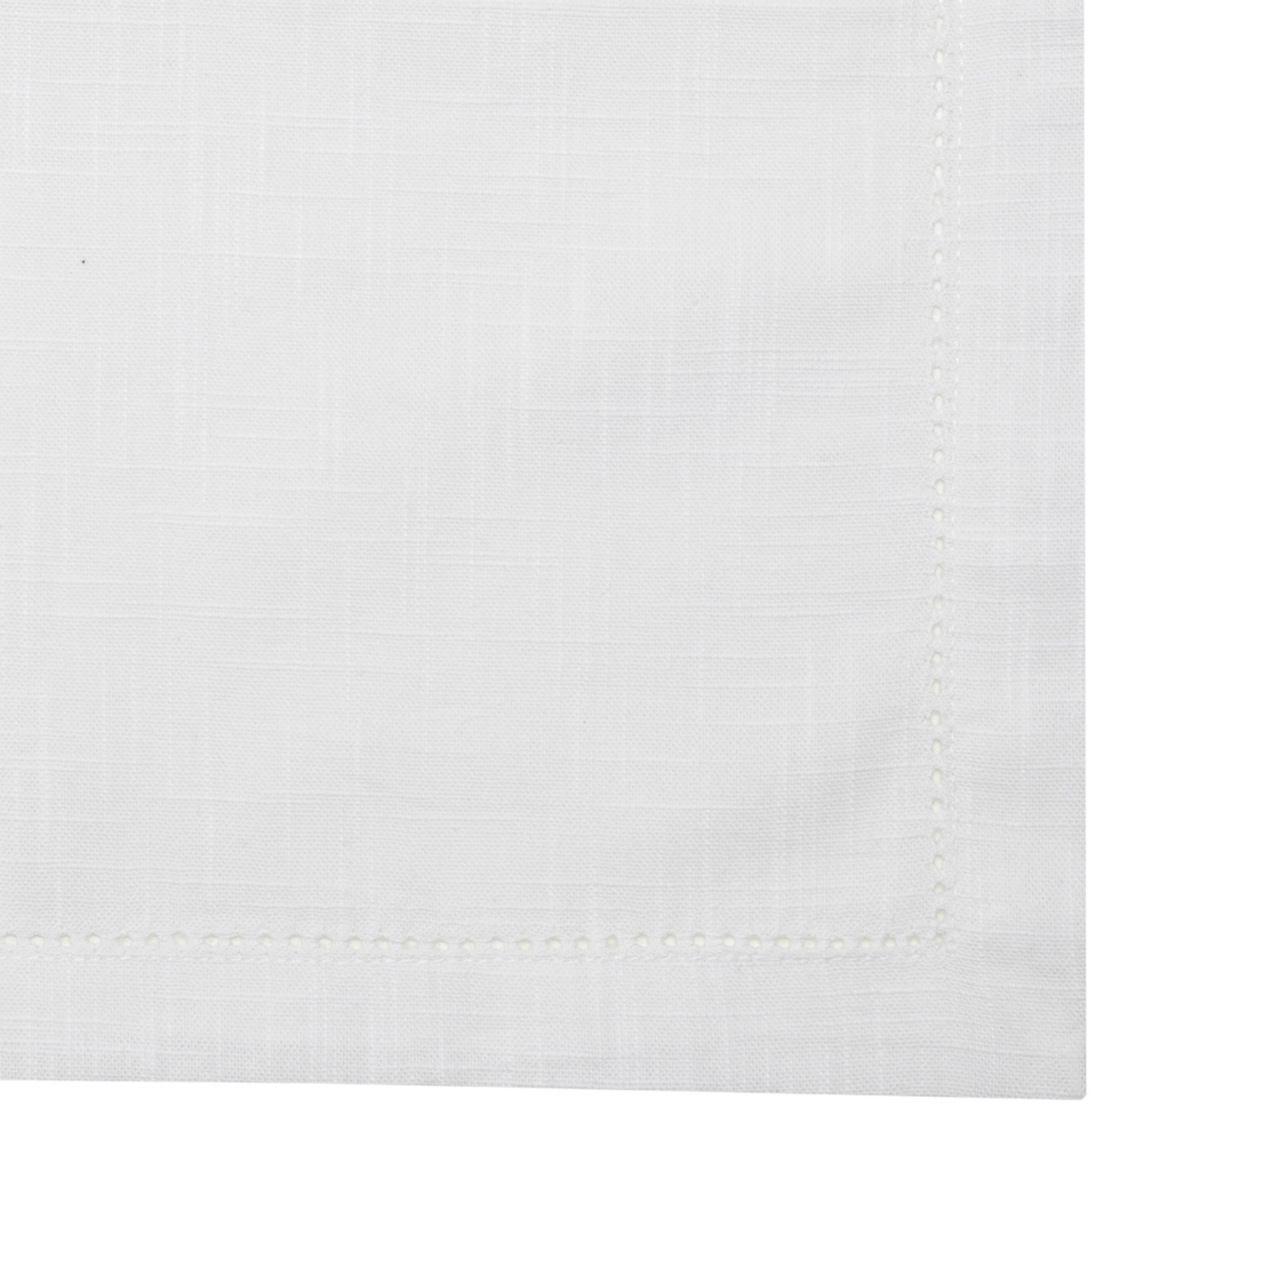 Conjunto 2 Guardanapos Ponto Ajour Algodao Luxo Branco 40x40cm